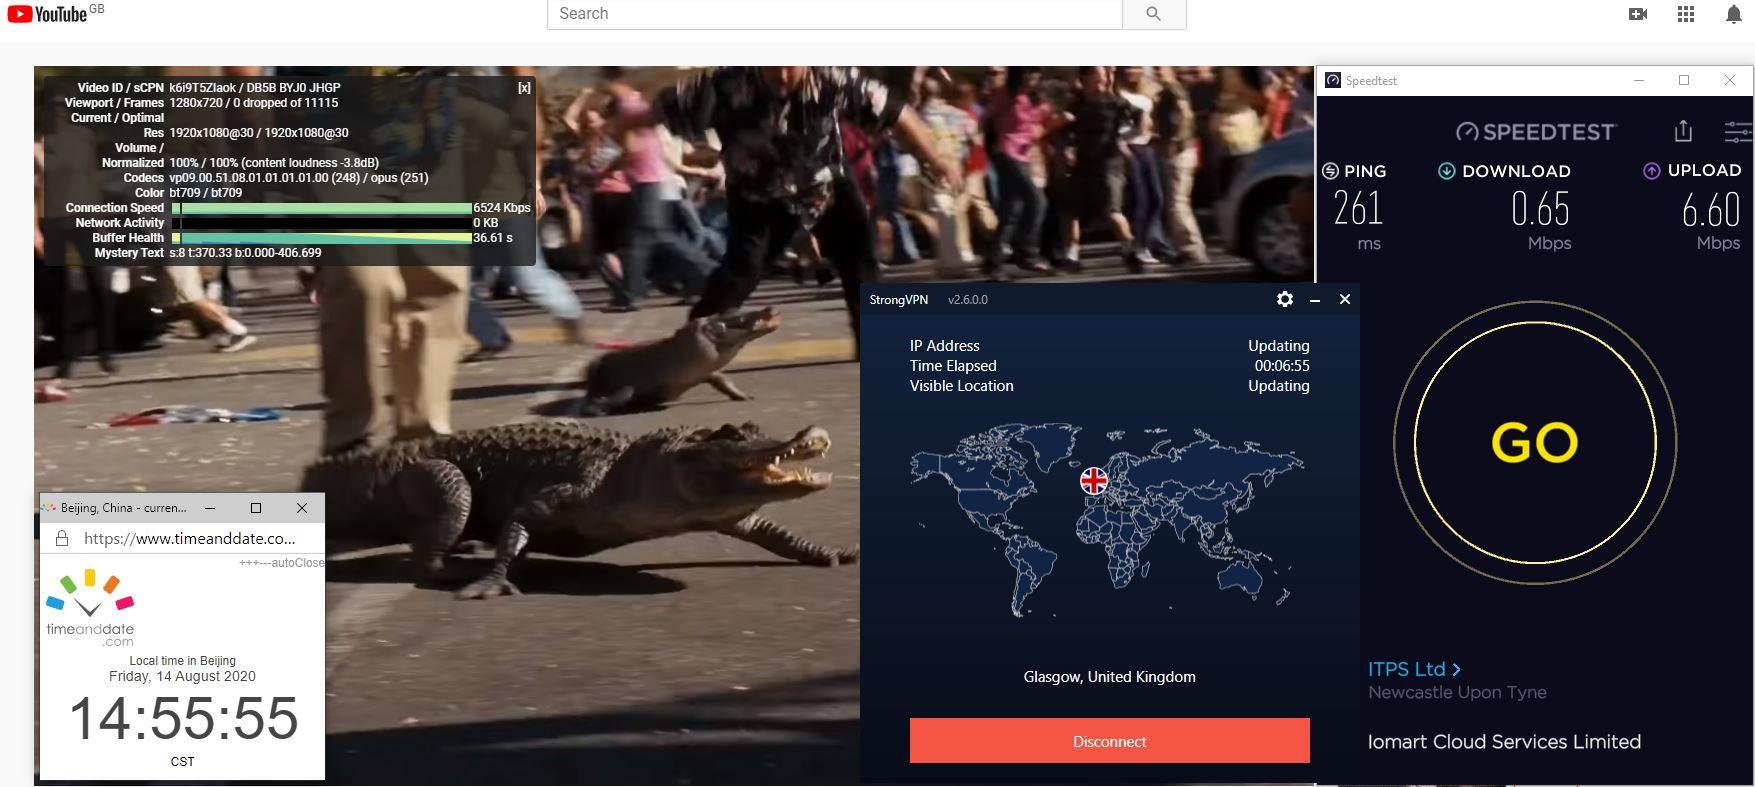 Windows10 StrongVPN IKEv2 UK- Glasgow 中国VPN 翻墙 科学上网 翻墙速度测试 - 20200814